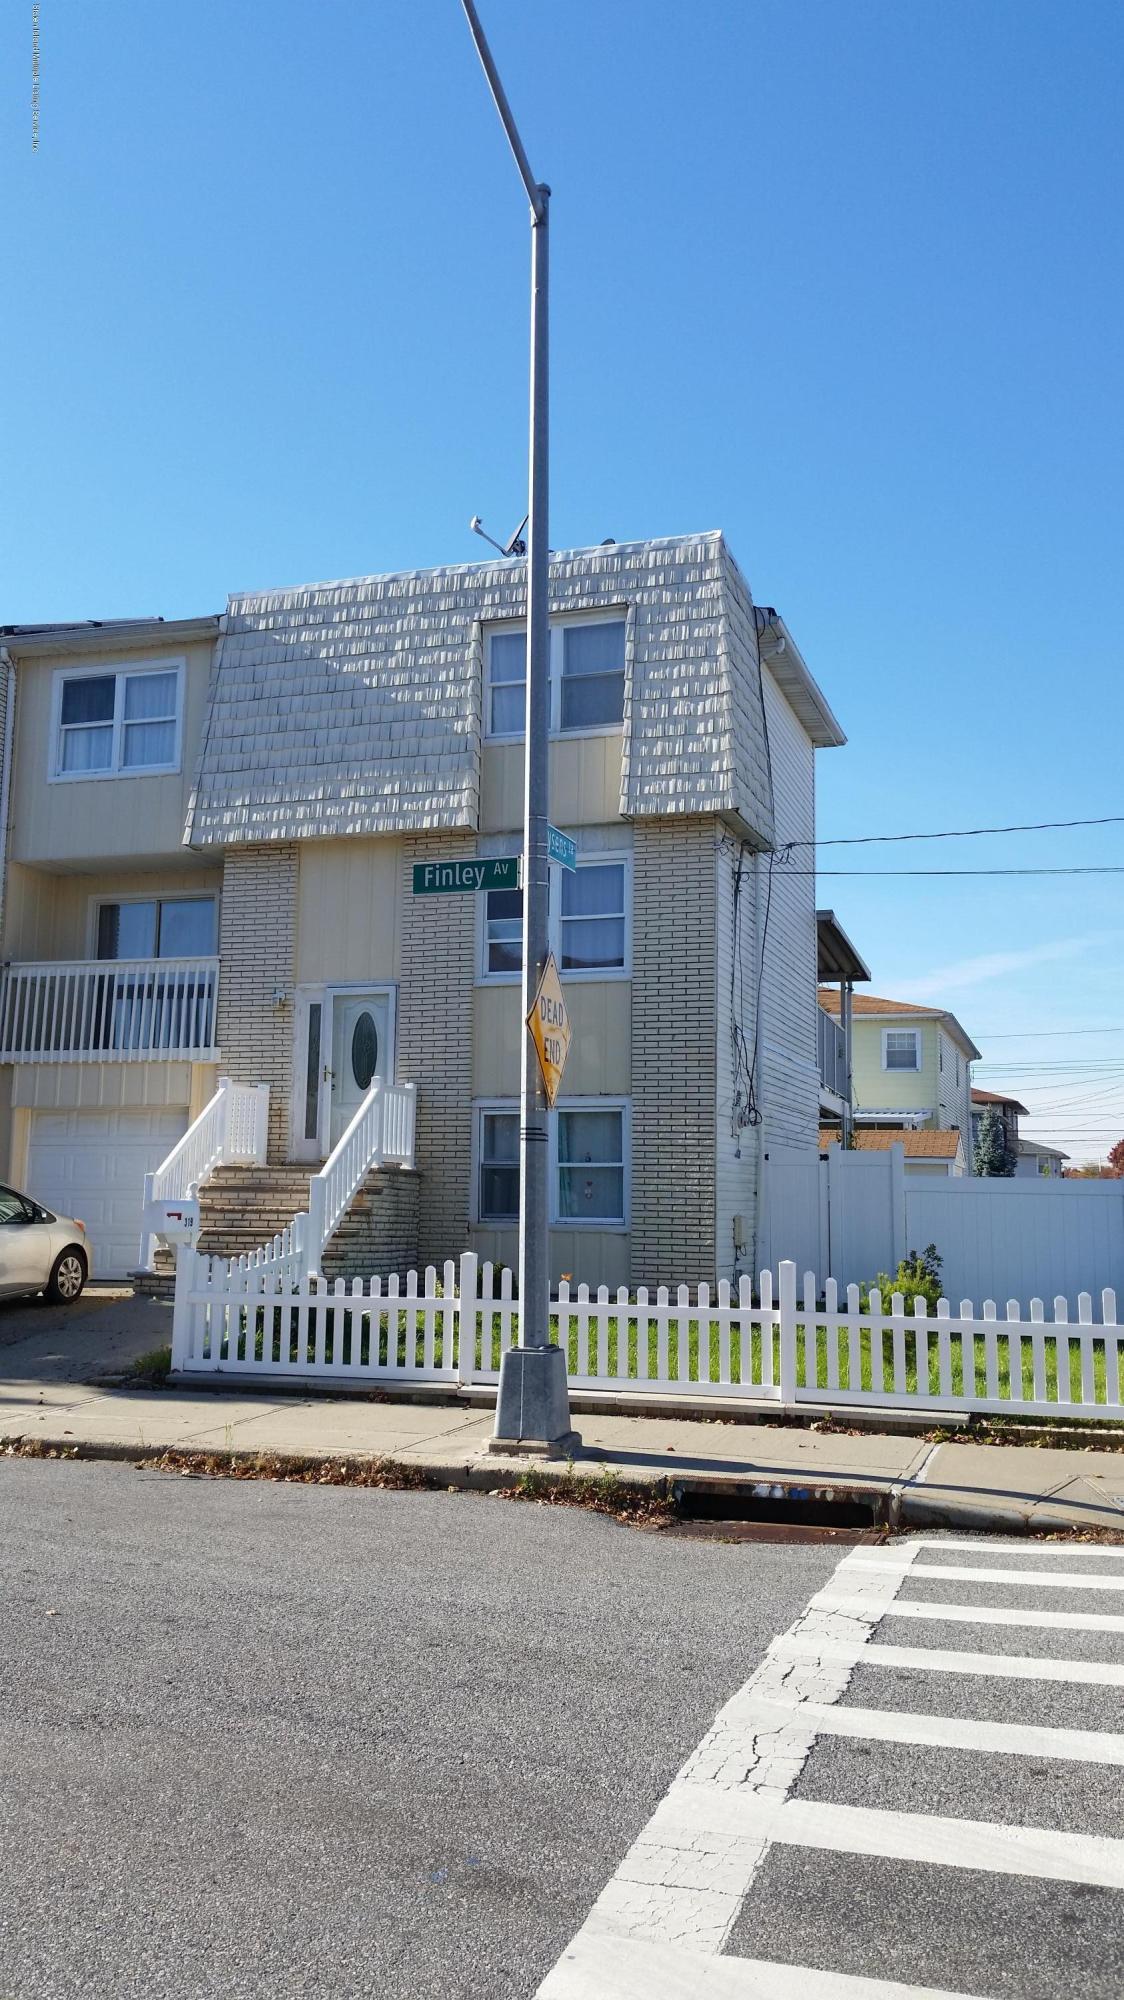 Single Family - Semi-Attached in New Dorp - 319 Finley Avenue  Staten Island, NY 10306